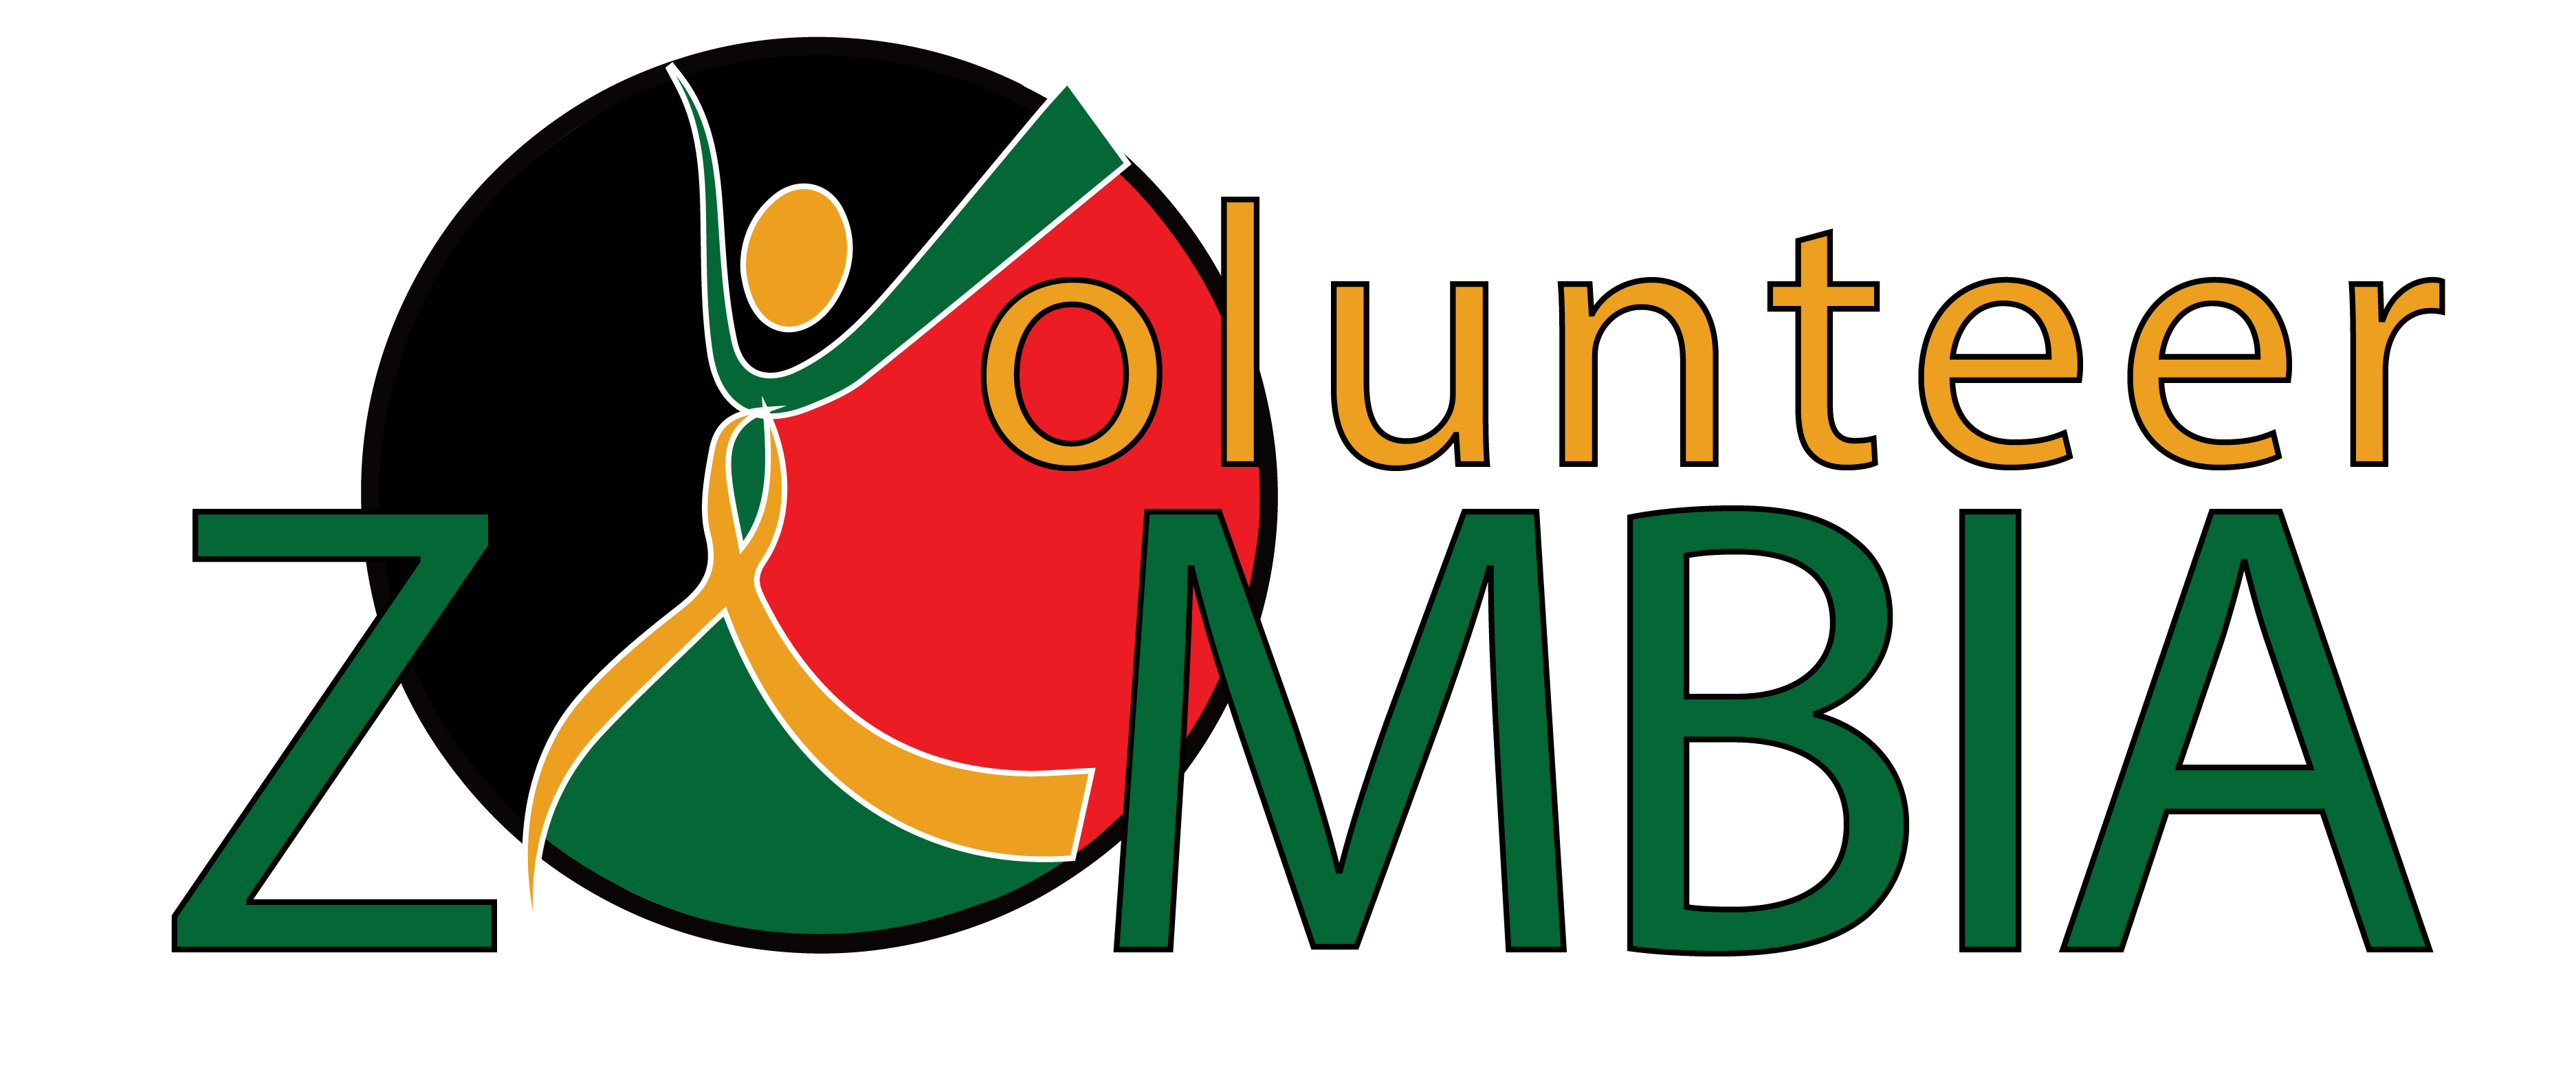 3747x1575 Volunteer Zambia Developing People, Inspiring A Nation Team Bath